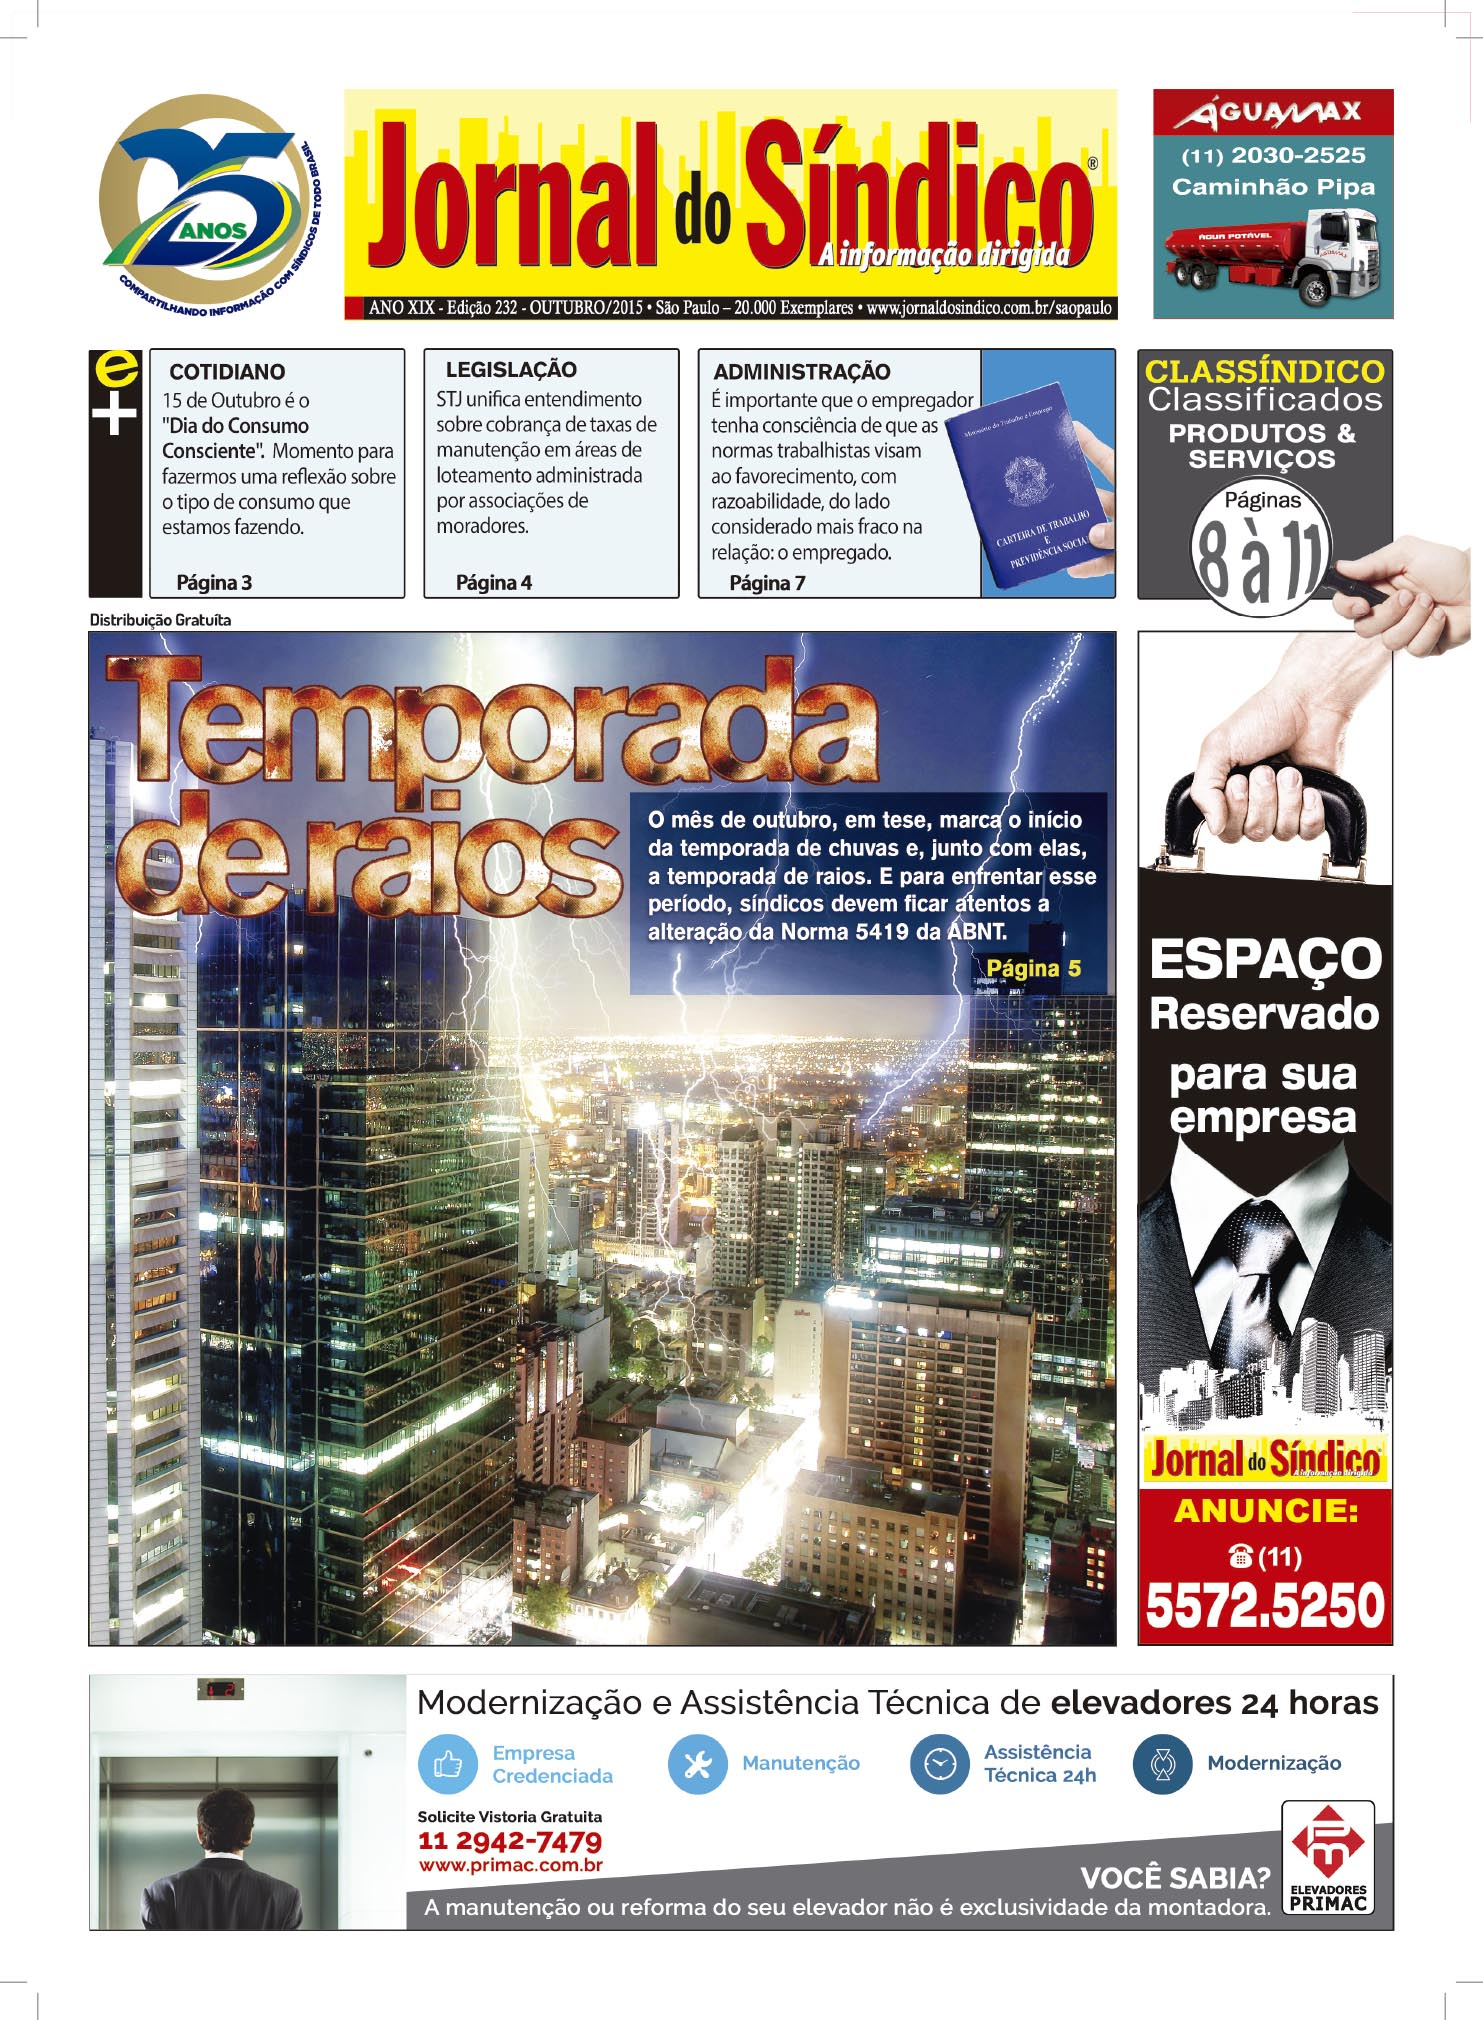 Jornal do Sindico Edic 232.indd